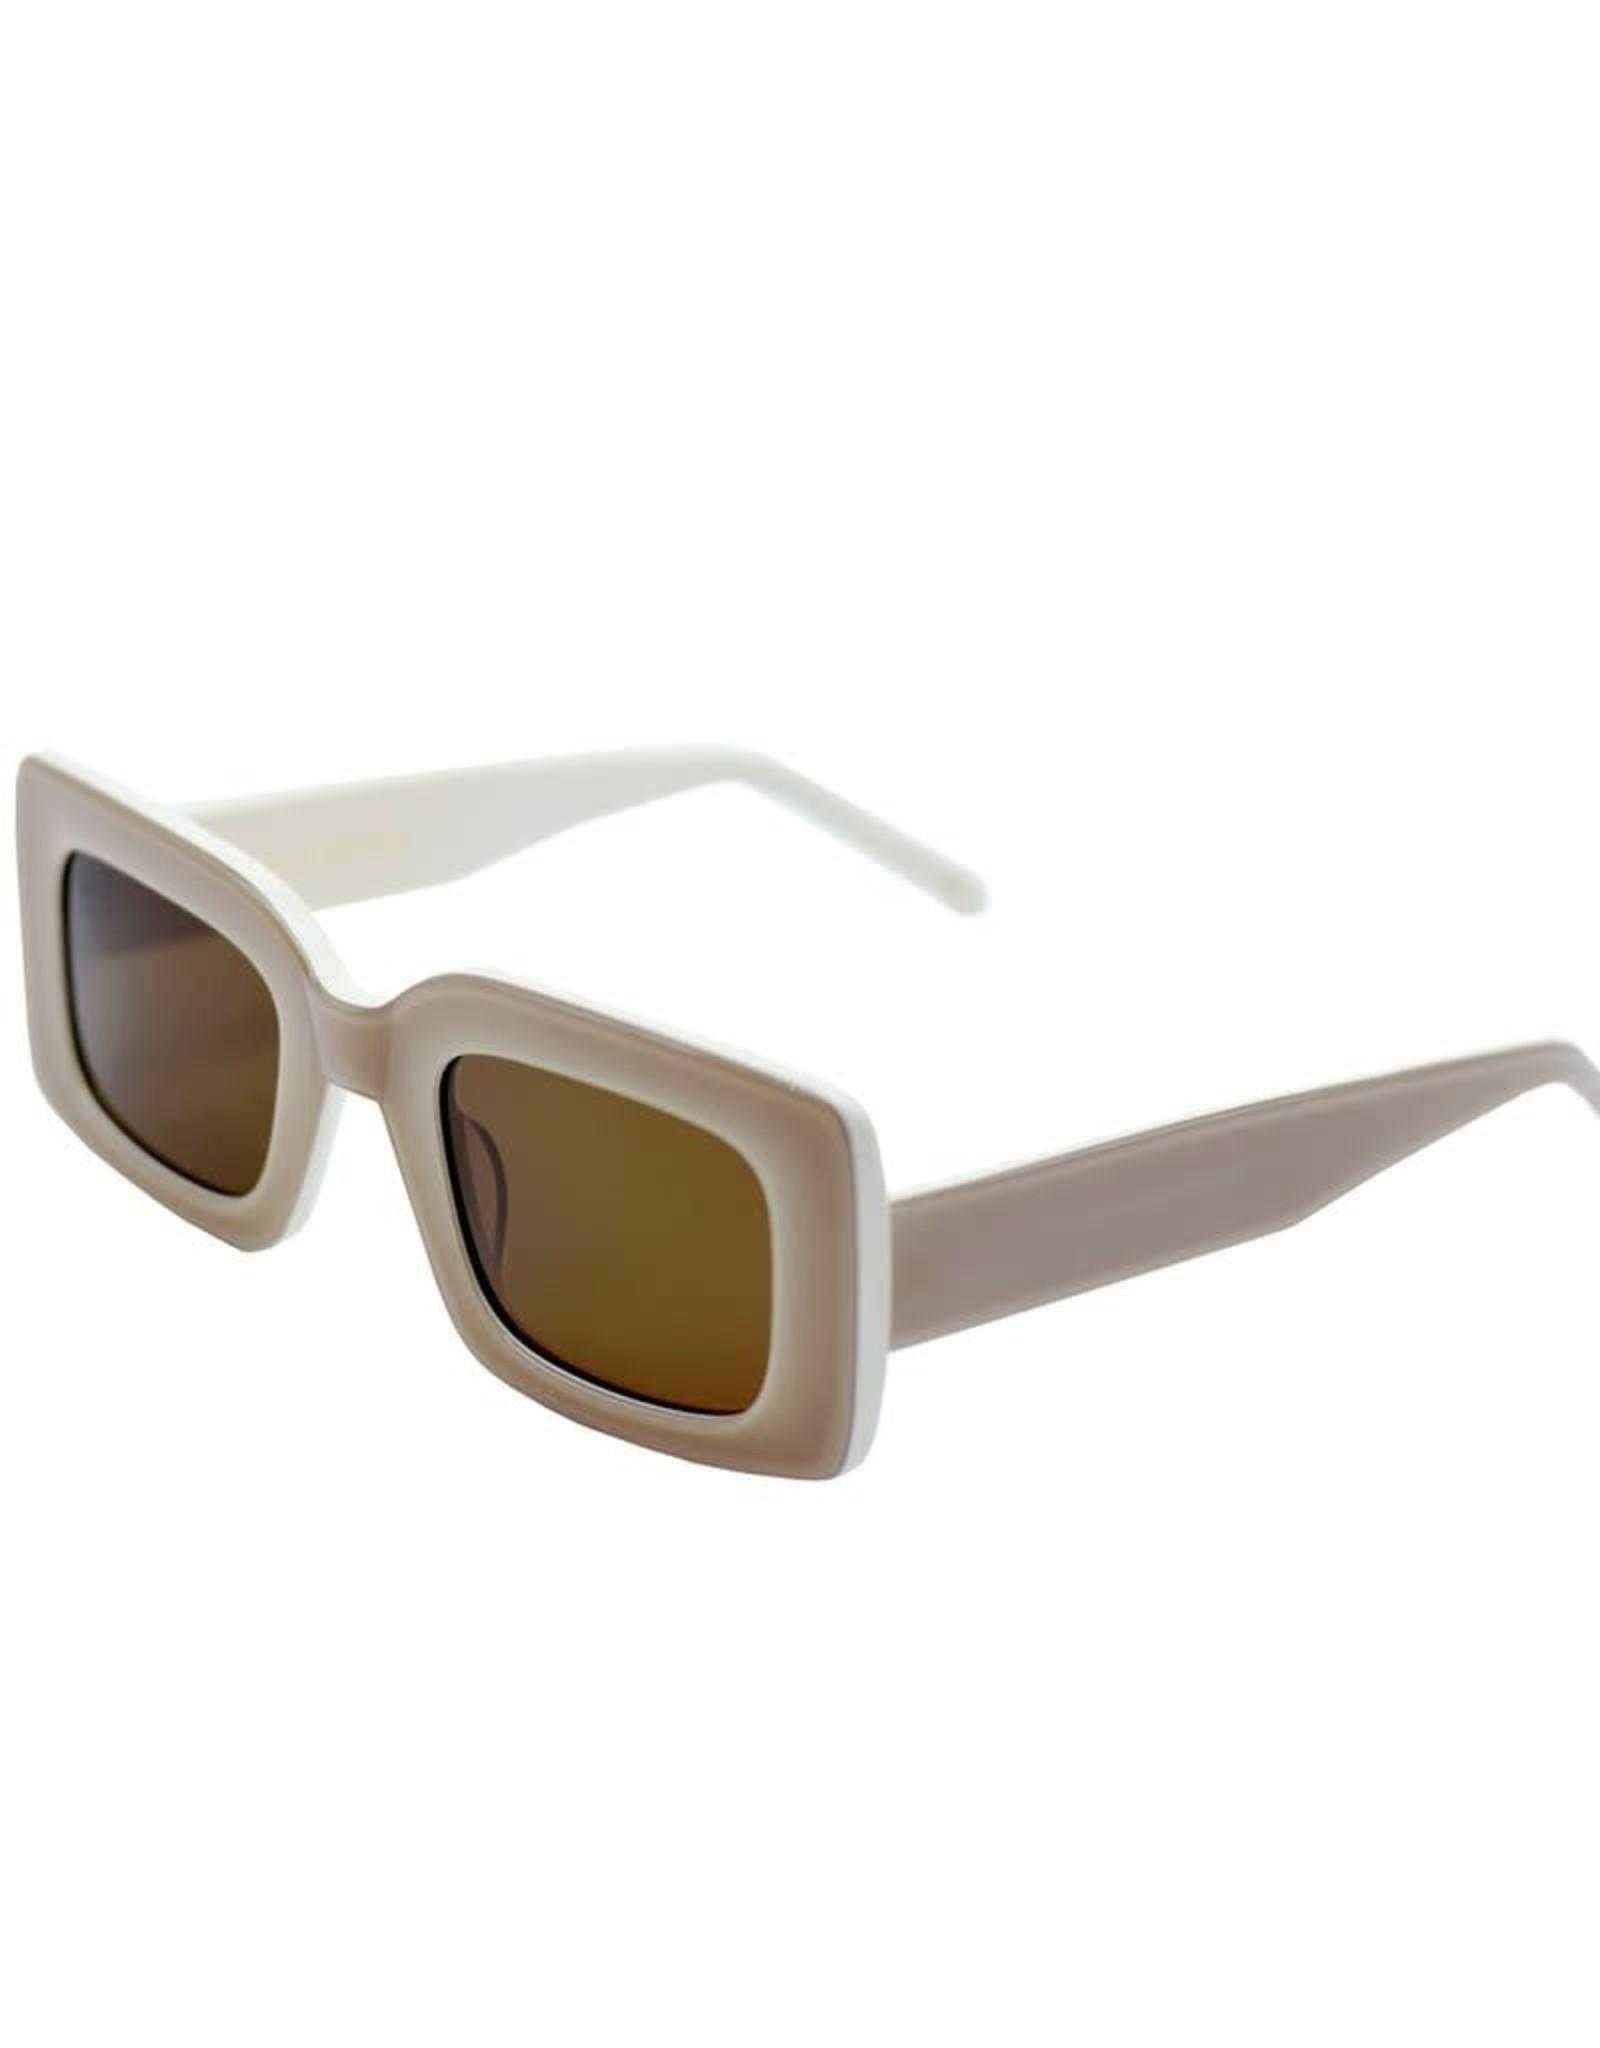 Shevoke Zingaro Sunglasses